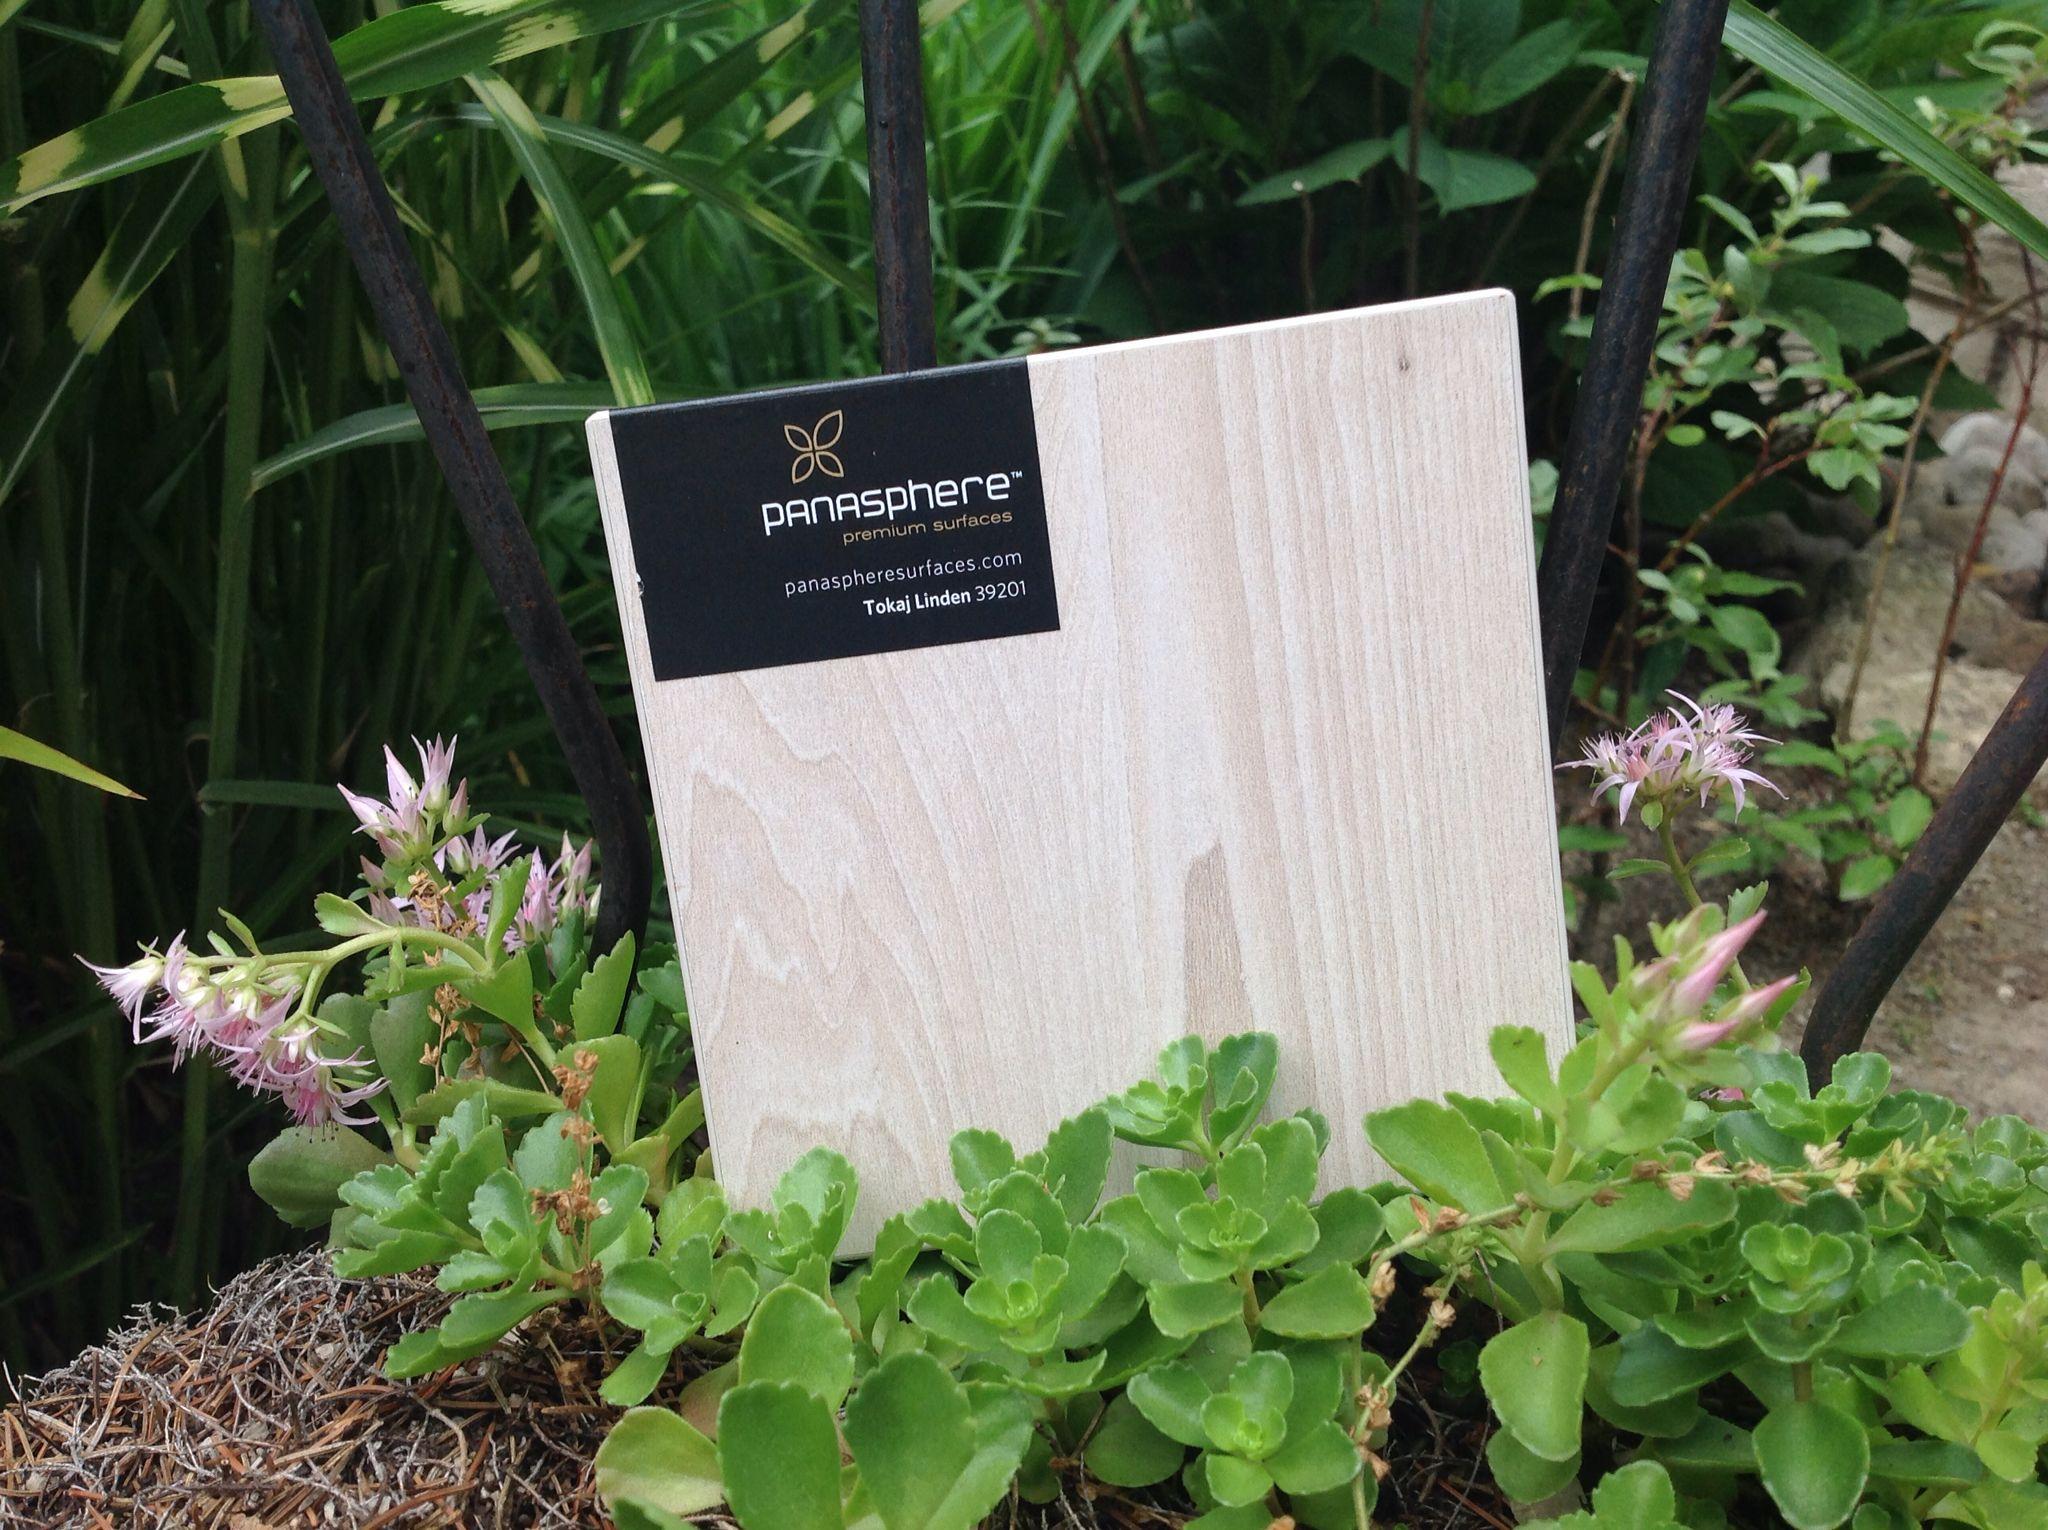 Tokaj Linden 39201. Panasphere's TFLaminate surface designs at Monarch Custom Plywood Inc. T. 905.669.6800. Monarch Custom Plywood Inc. is Panasphere Surfaces distributor in Ontario, Canada. Monarchply.com